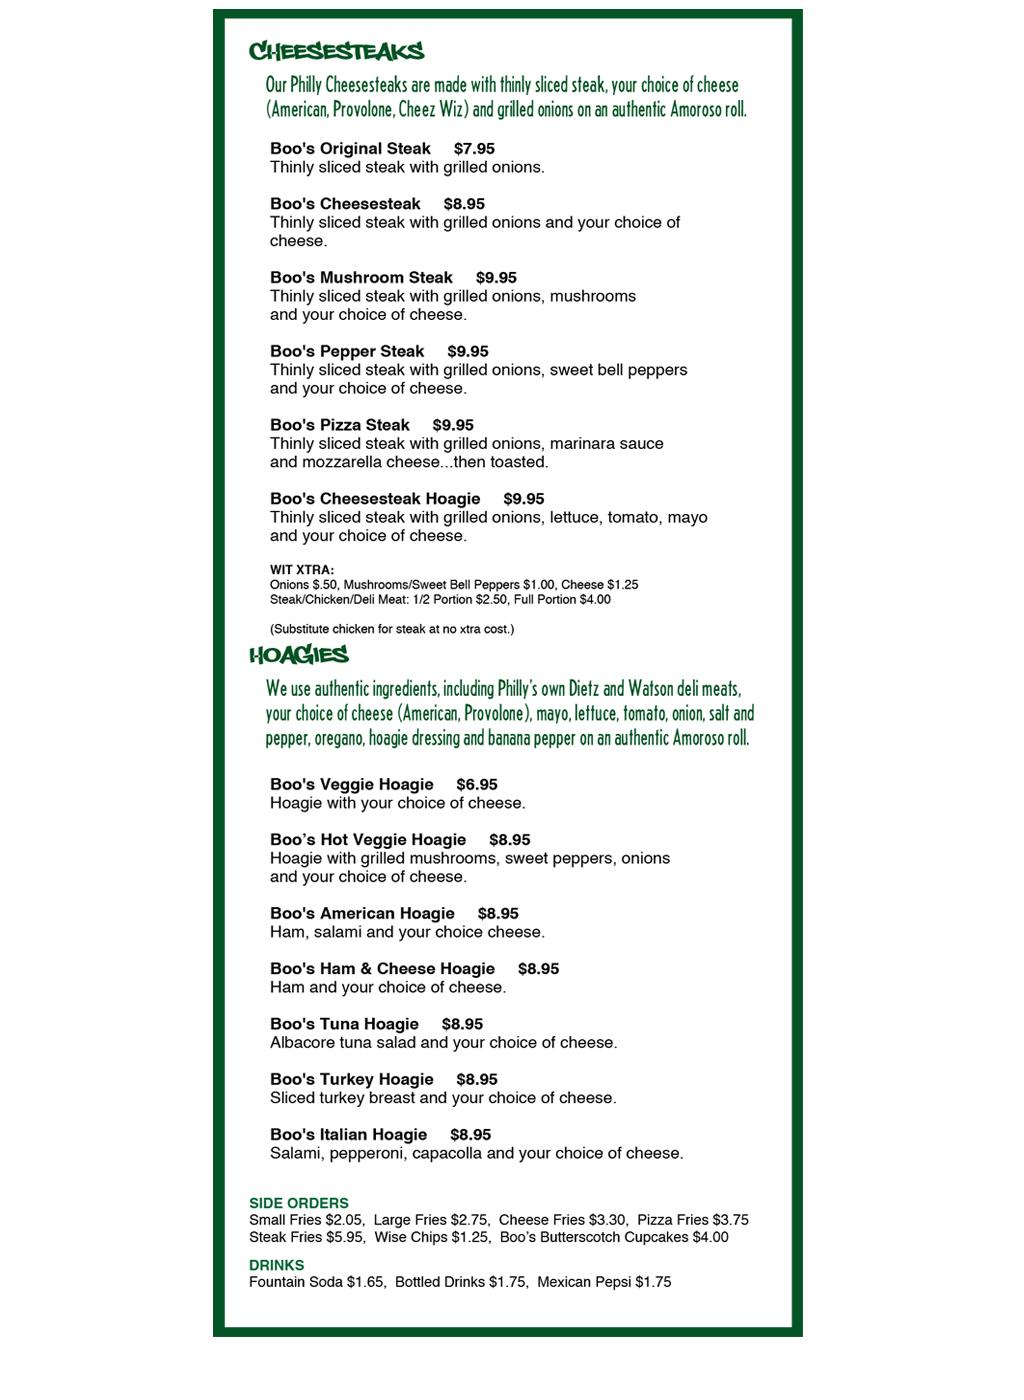 Best Cheese steak in Silver Lake | Silver Lake Cheese Steak | Hoagies Silver Lake CA